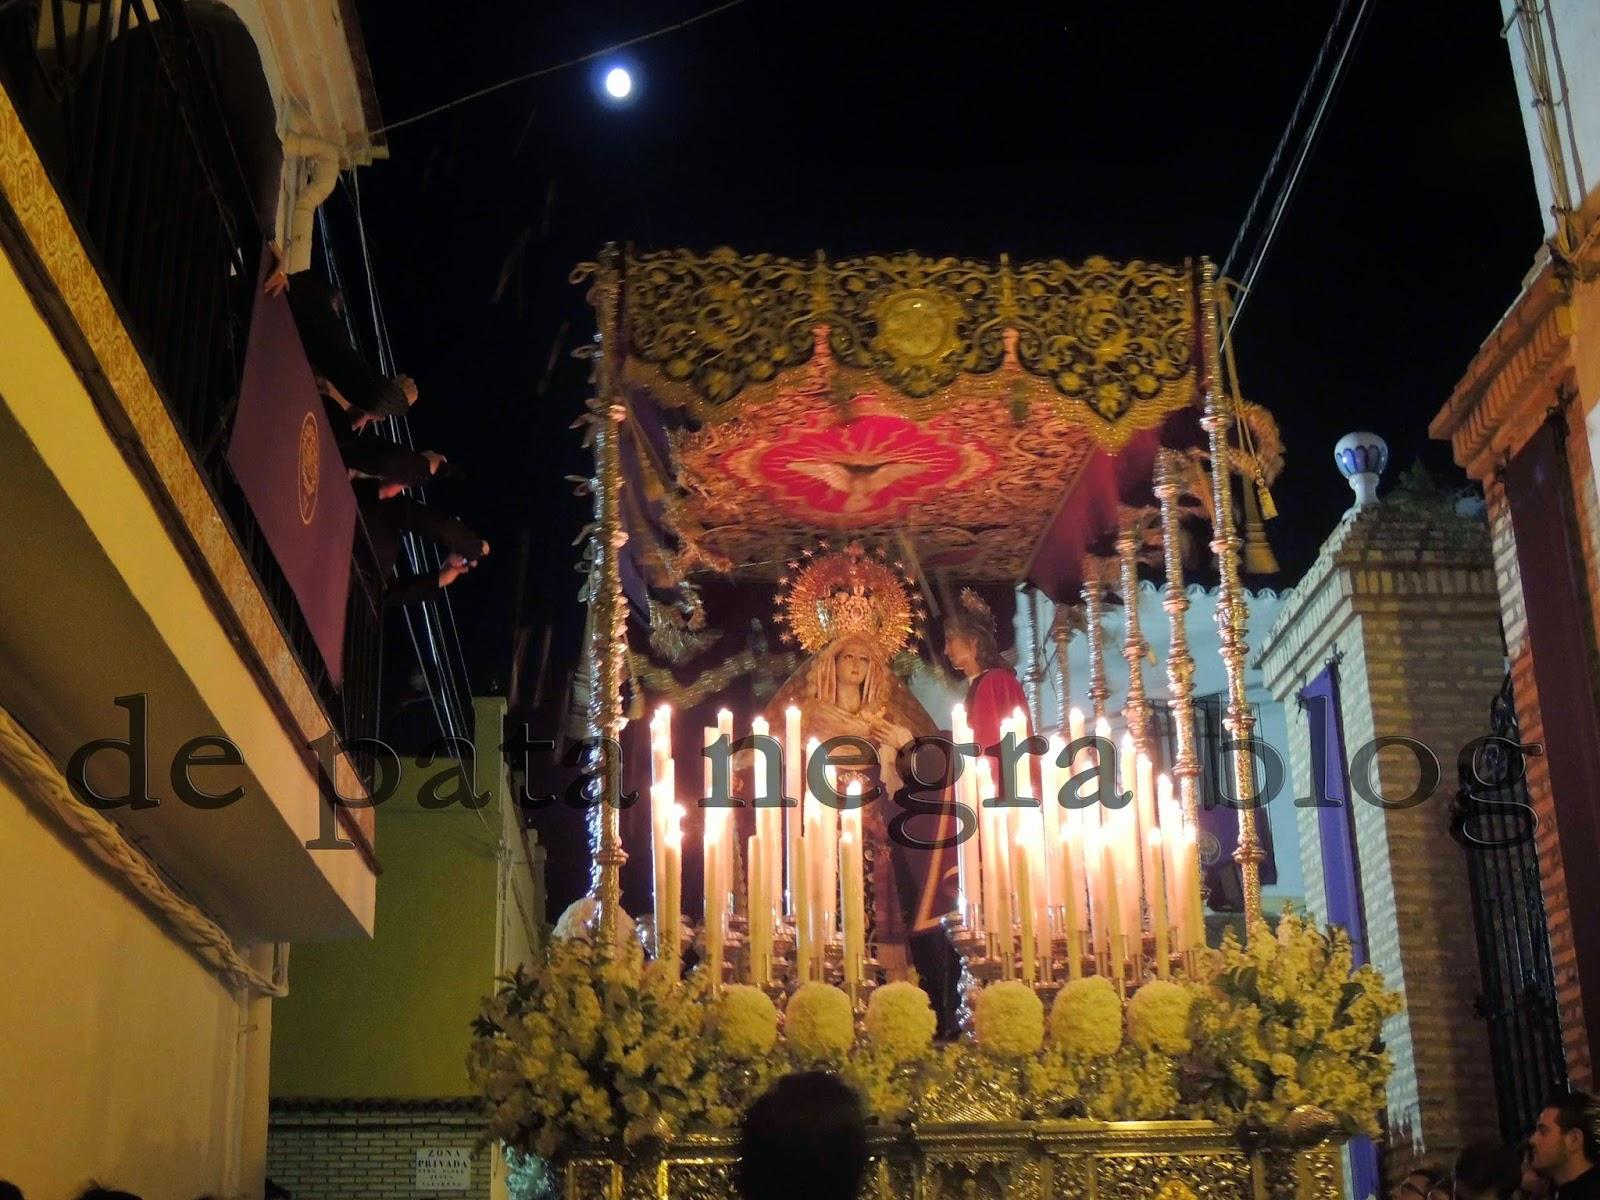 Madruga La Rambla